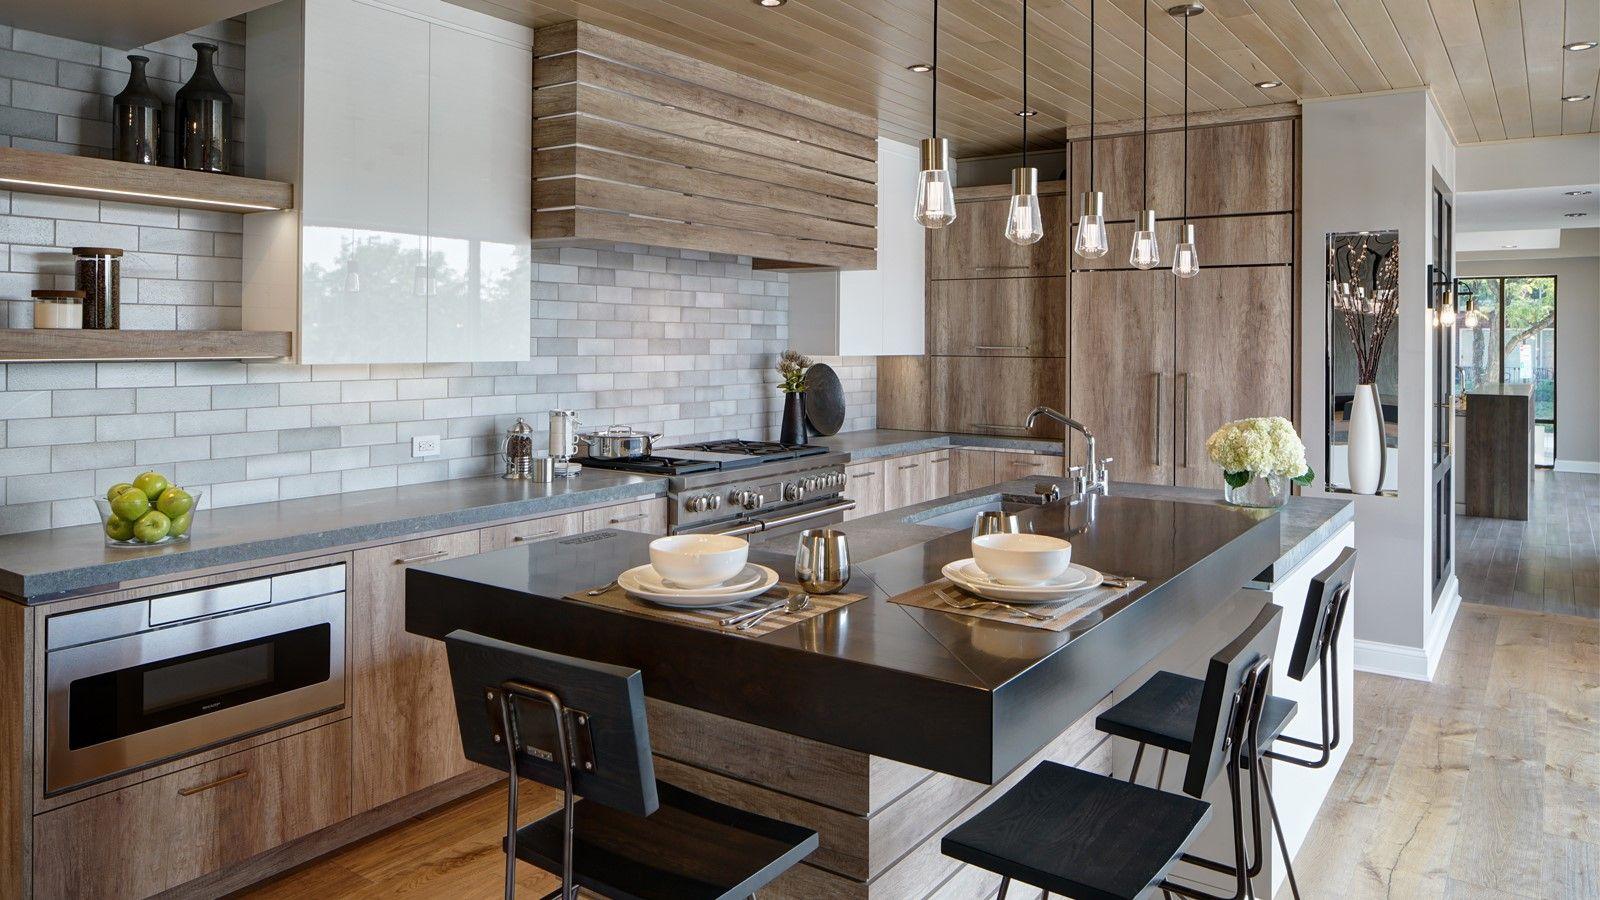 Top 15 Best Materials For Kitchen Countertops 2020 Kitchen